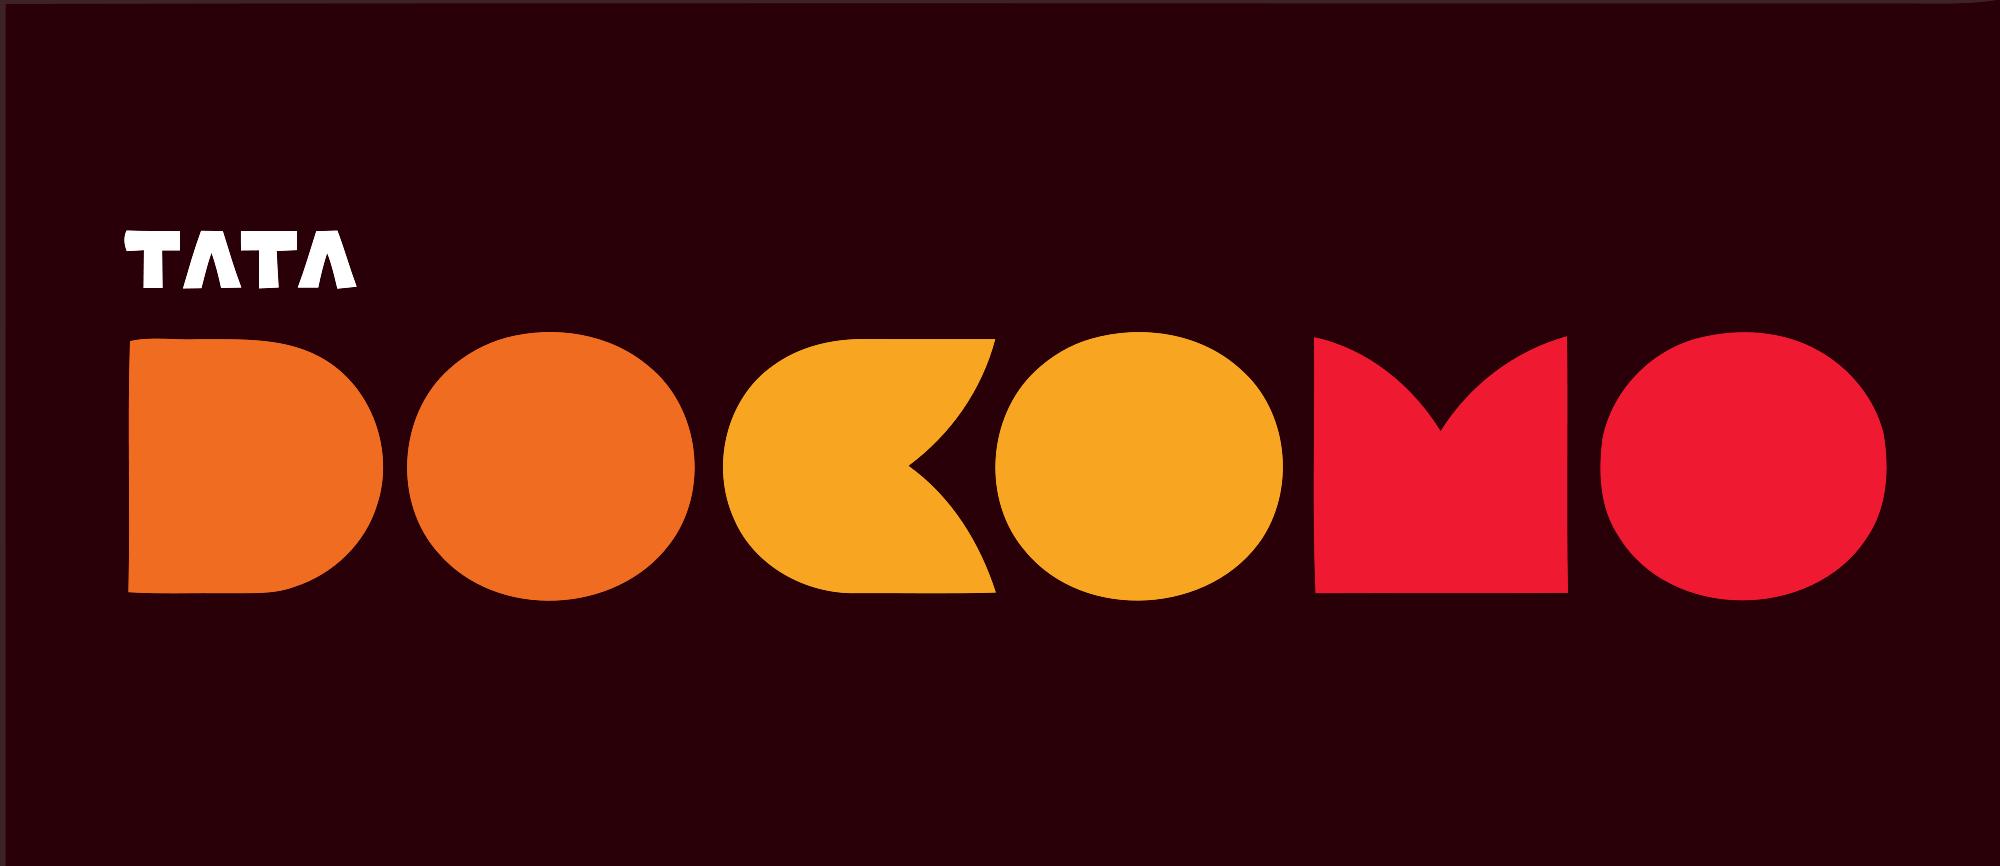 TATA Docomo 3G Offers / Packs Updated